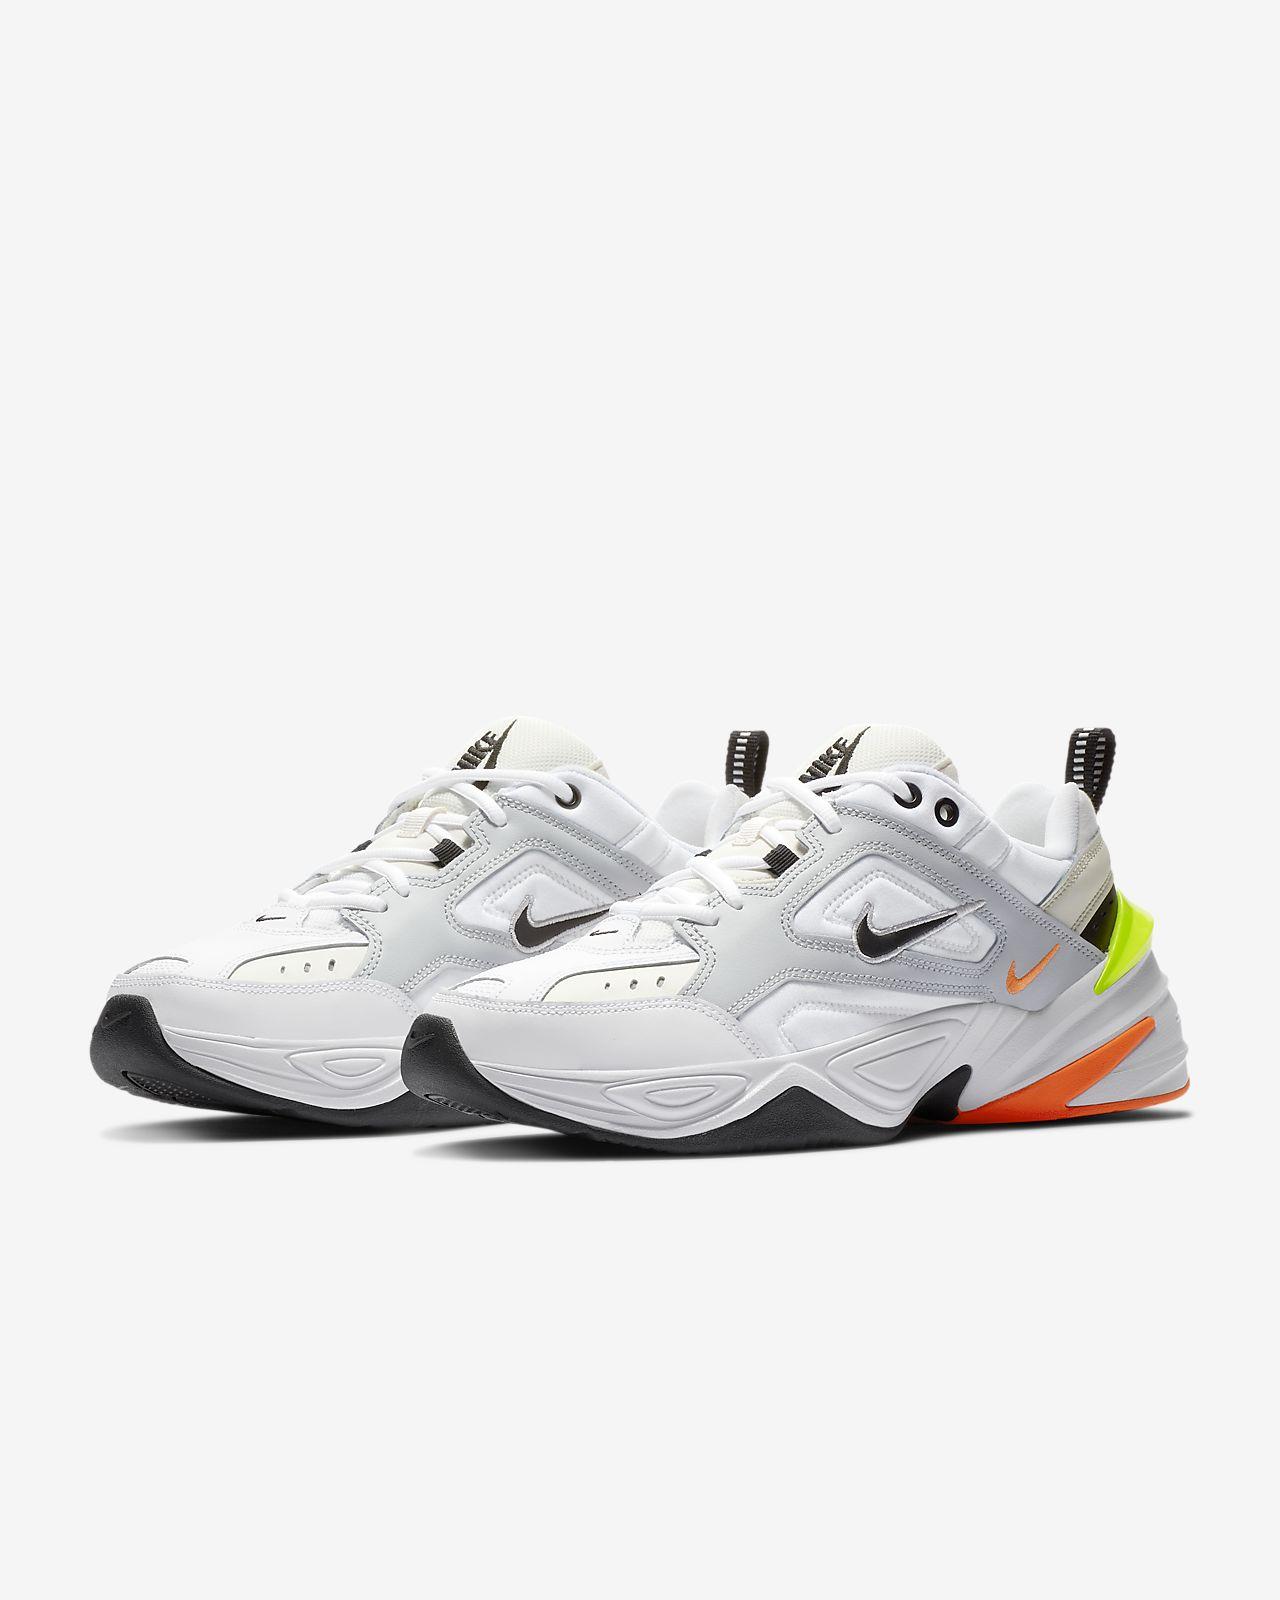 b3f8d51182d Nike M2K Tekno Men s Shoe. Nike.com GB